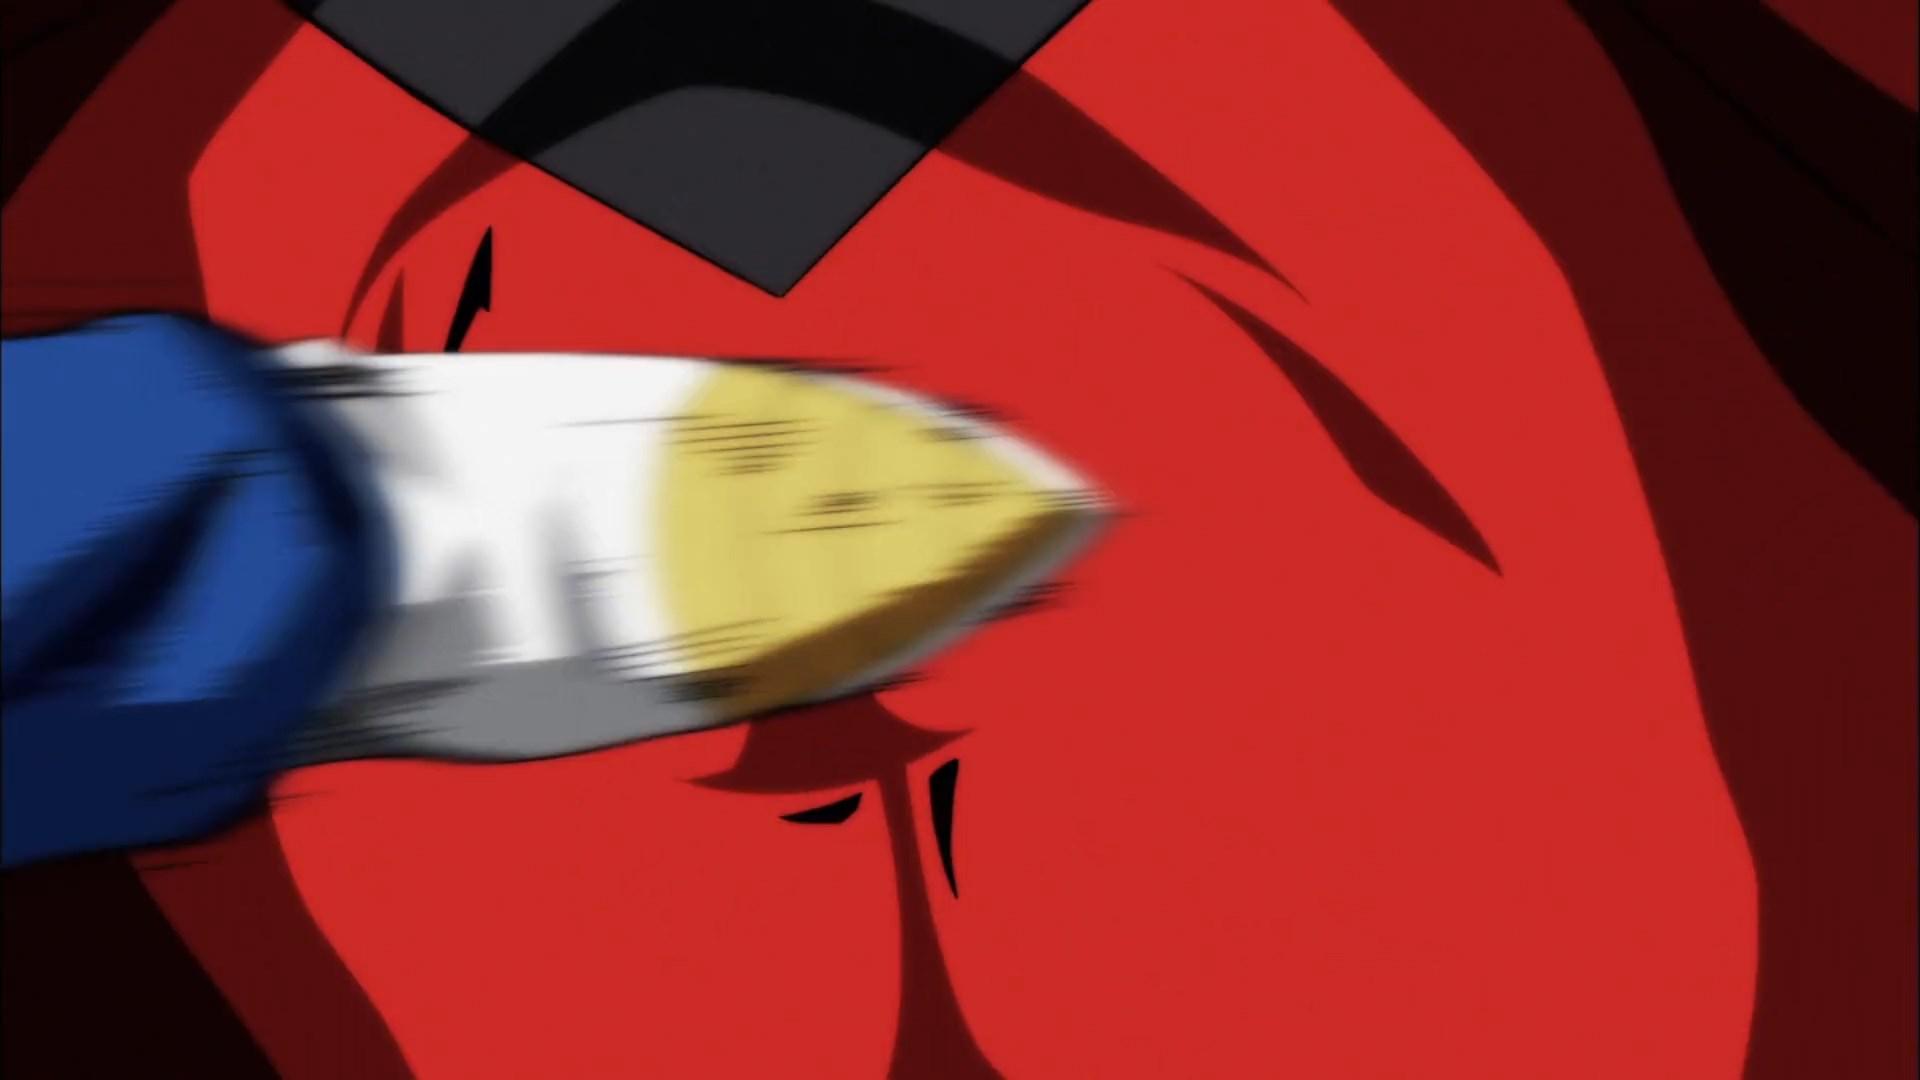 [HorribleSubs] Dragon Ball Super - 121 [1080p].mkv_snapshot_23.22